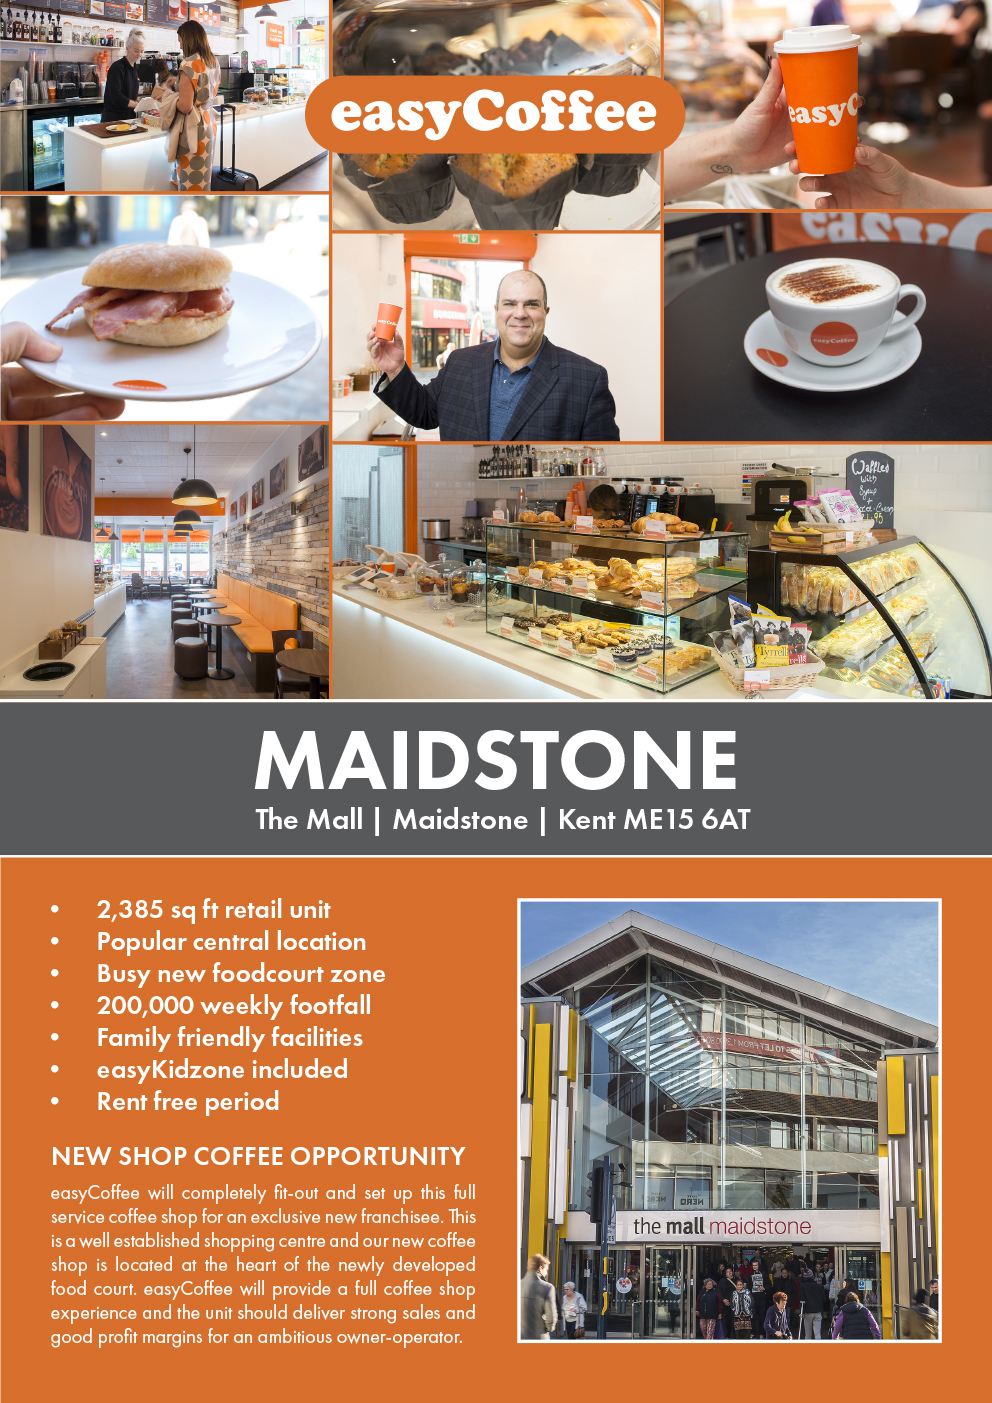 easyCoffee shop_Maidstone_1.jpg